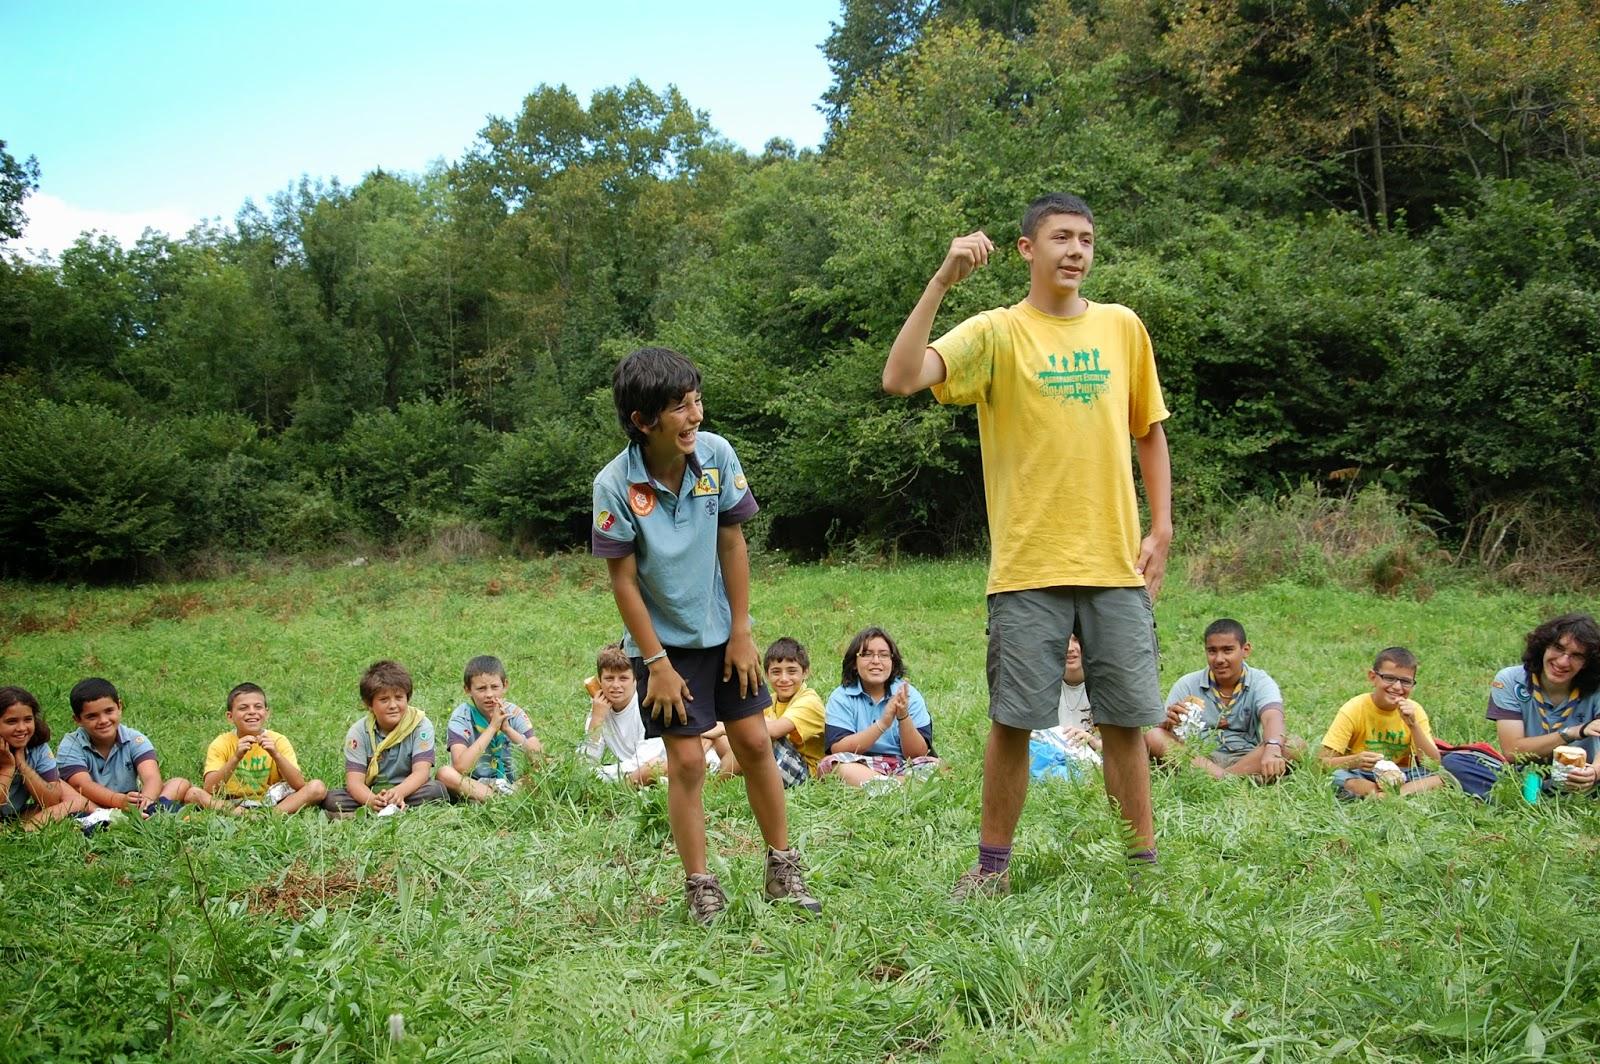 Campaments Estiu RolandKing 2011 - DSC_0056%2B2.JPG